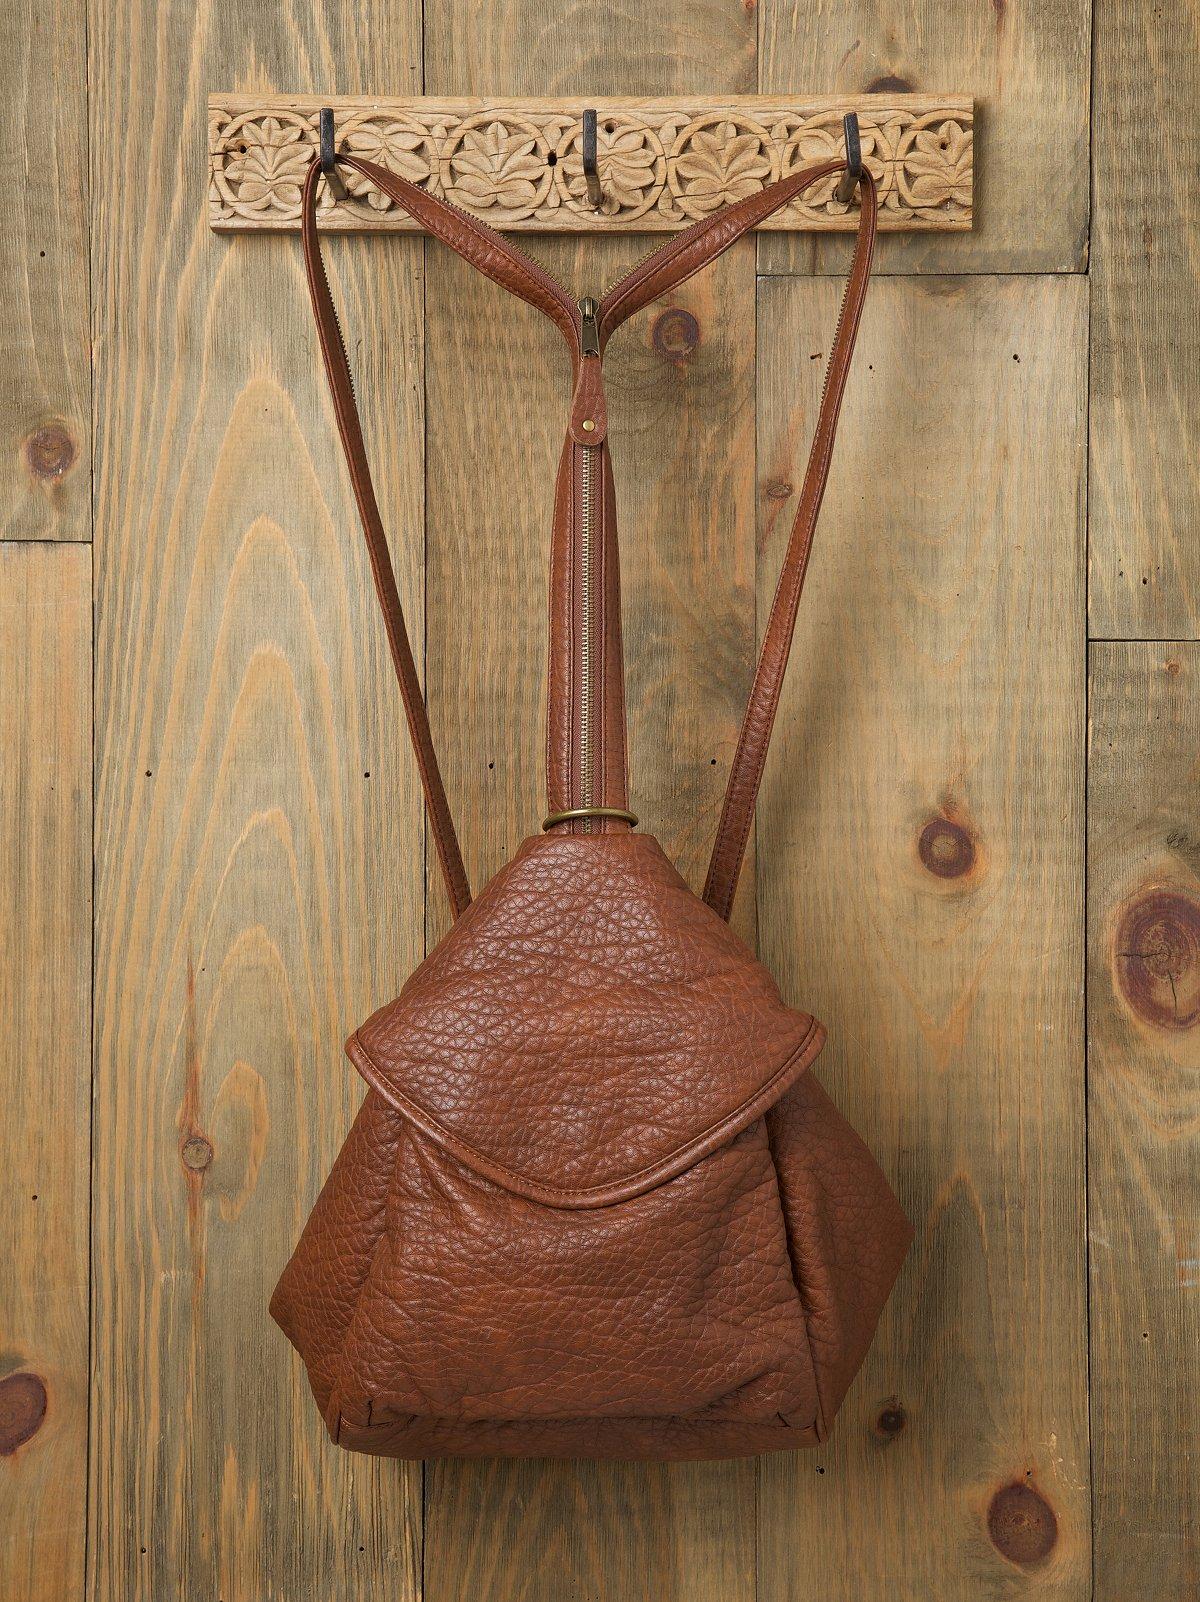 Convertible Traveler's Bag